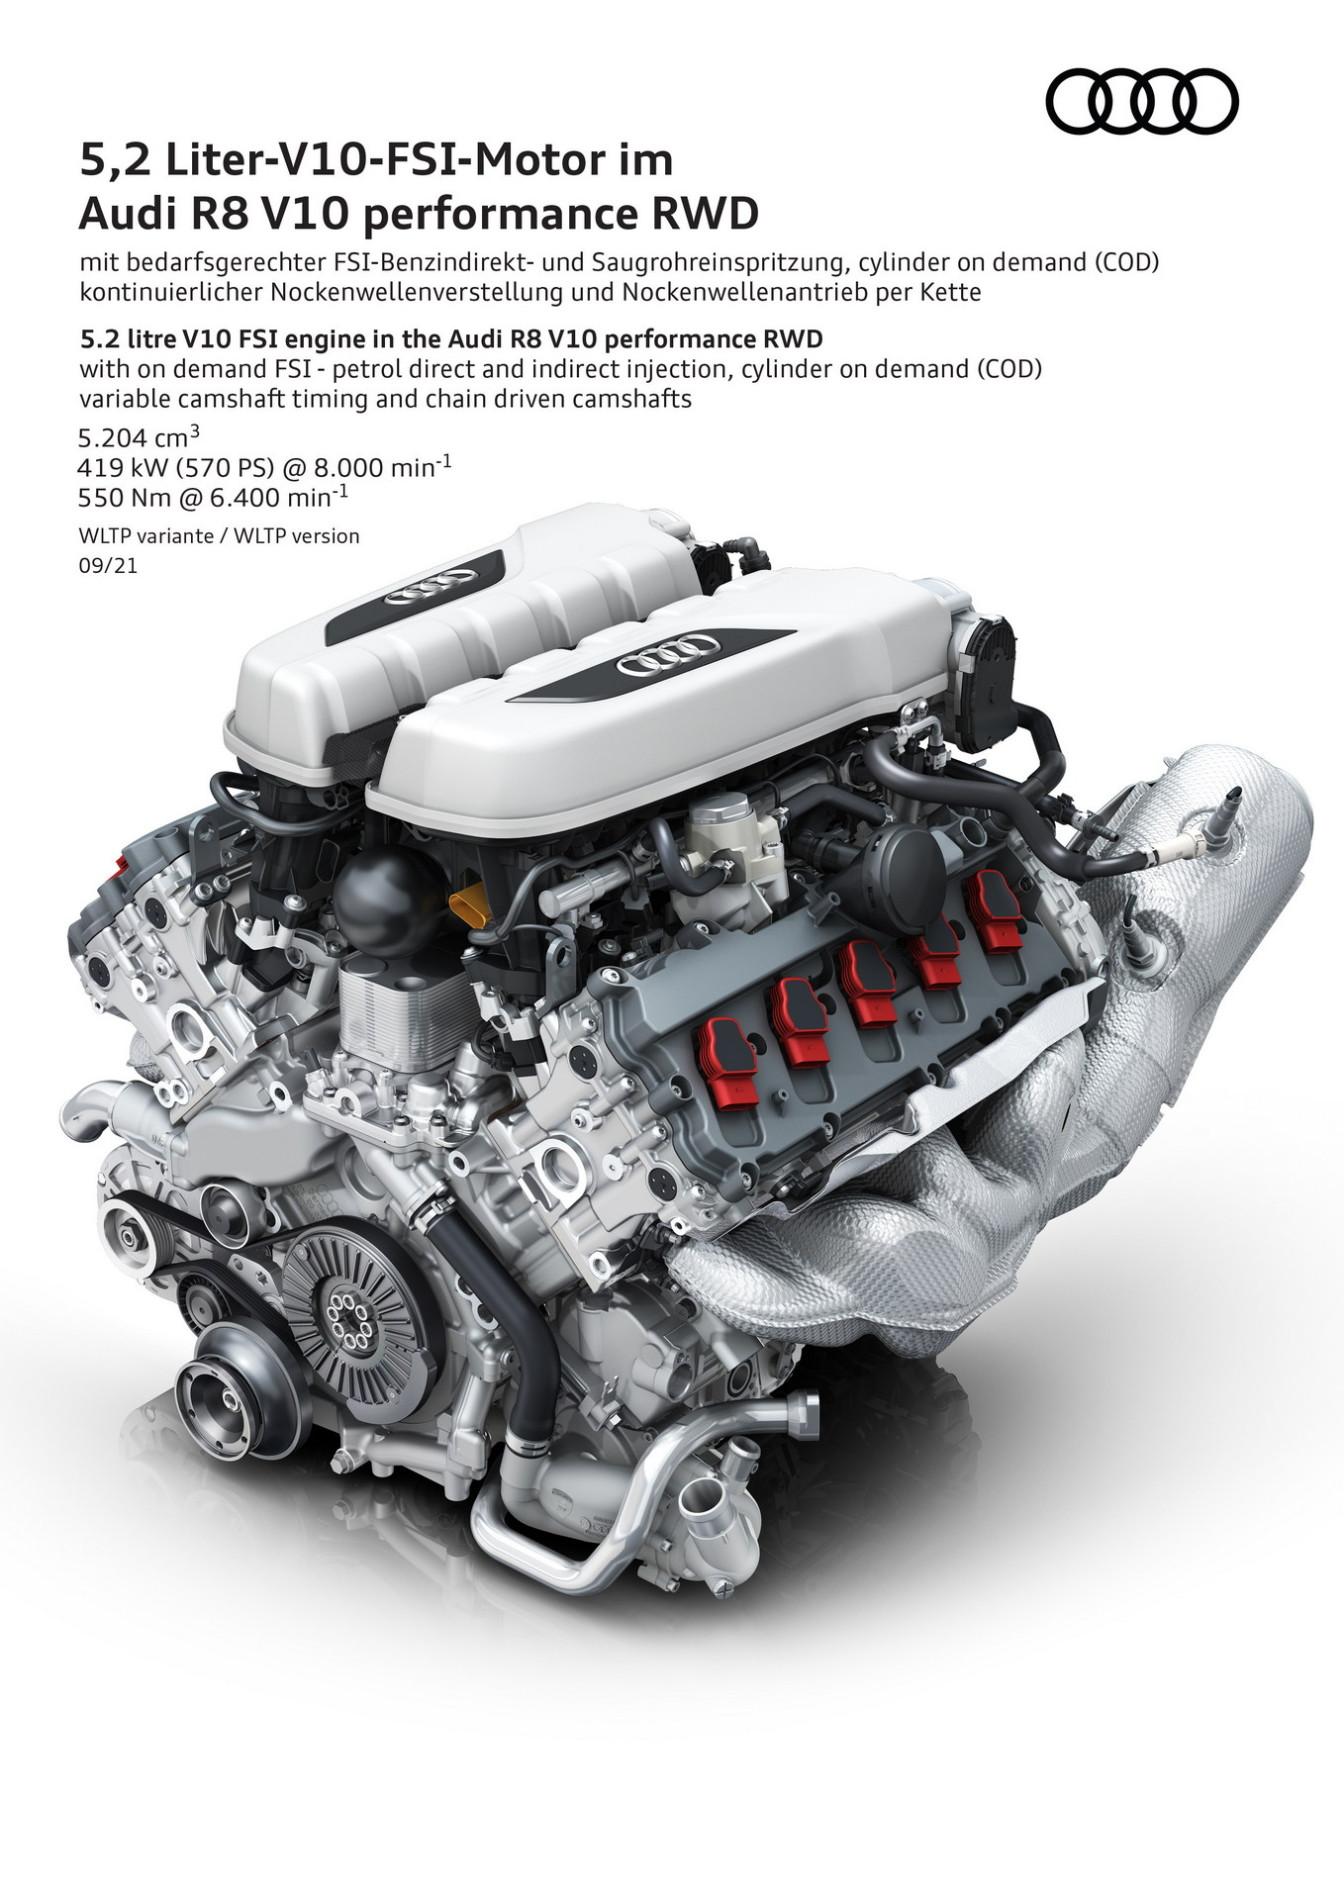 Audi R8 V10 Performance RWD - Audi R8 V10 Performance RWD